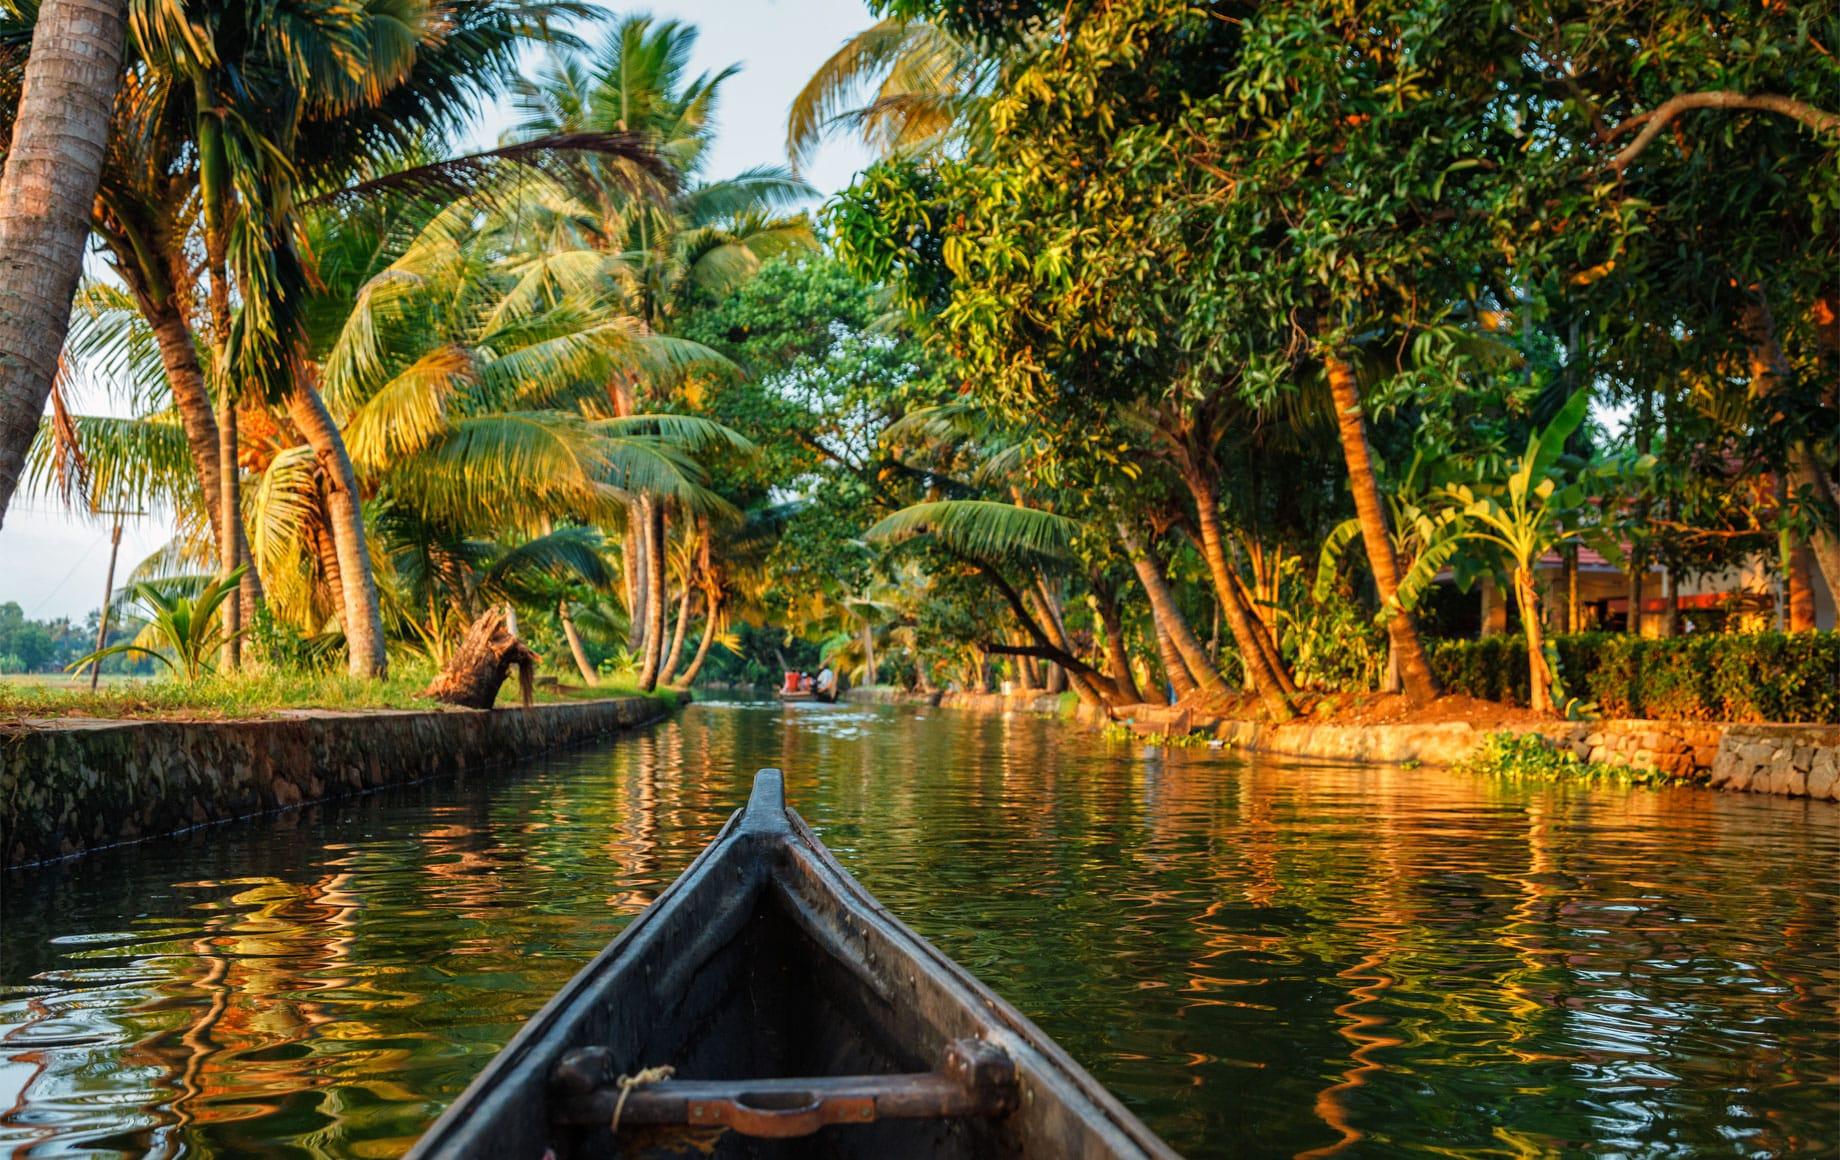 Tourist arrivals surge in Kerala